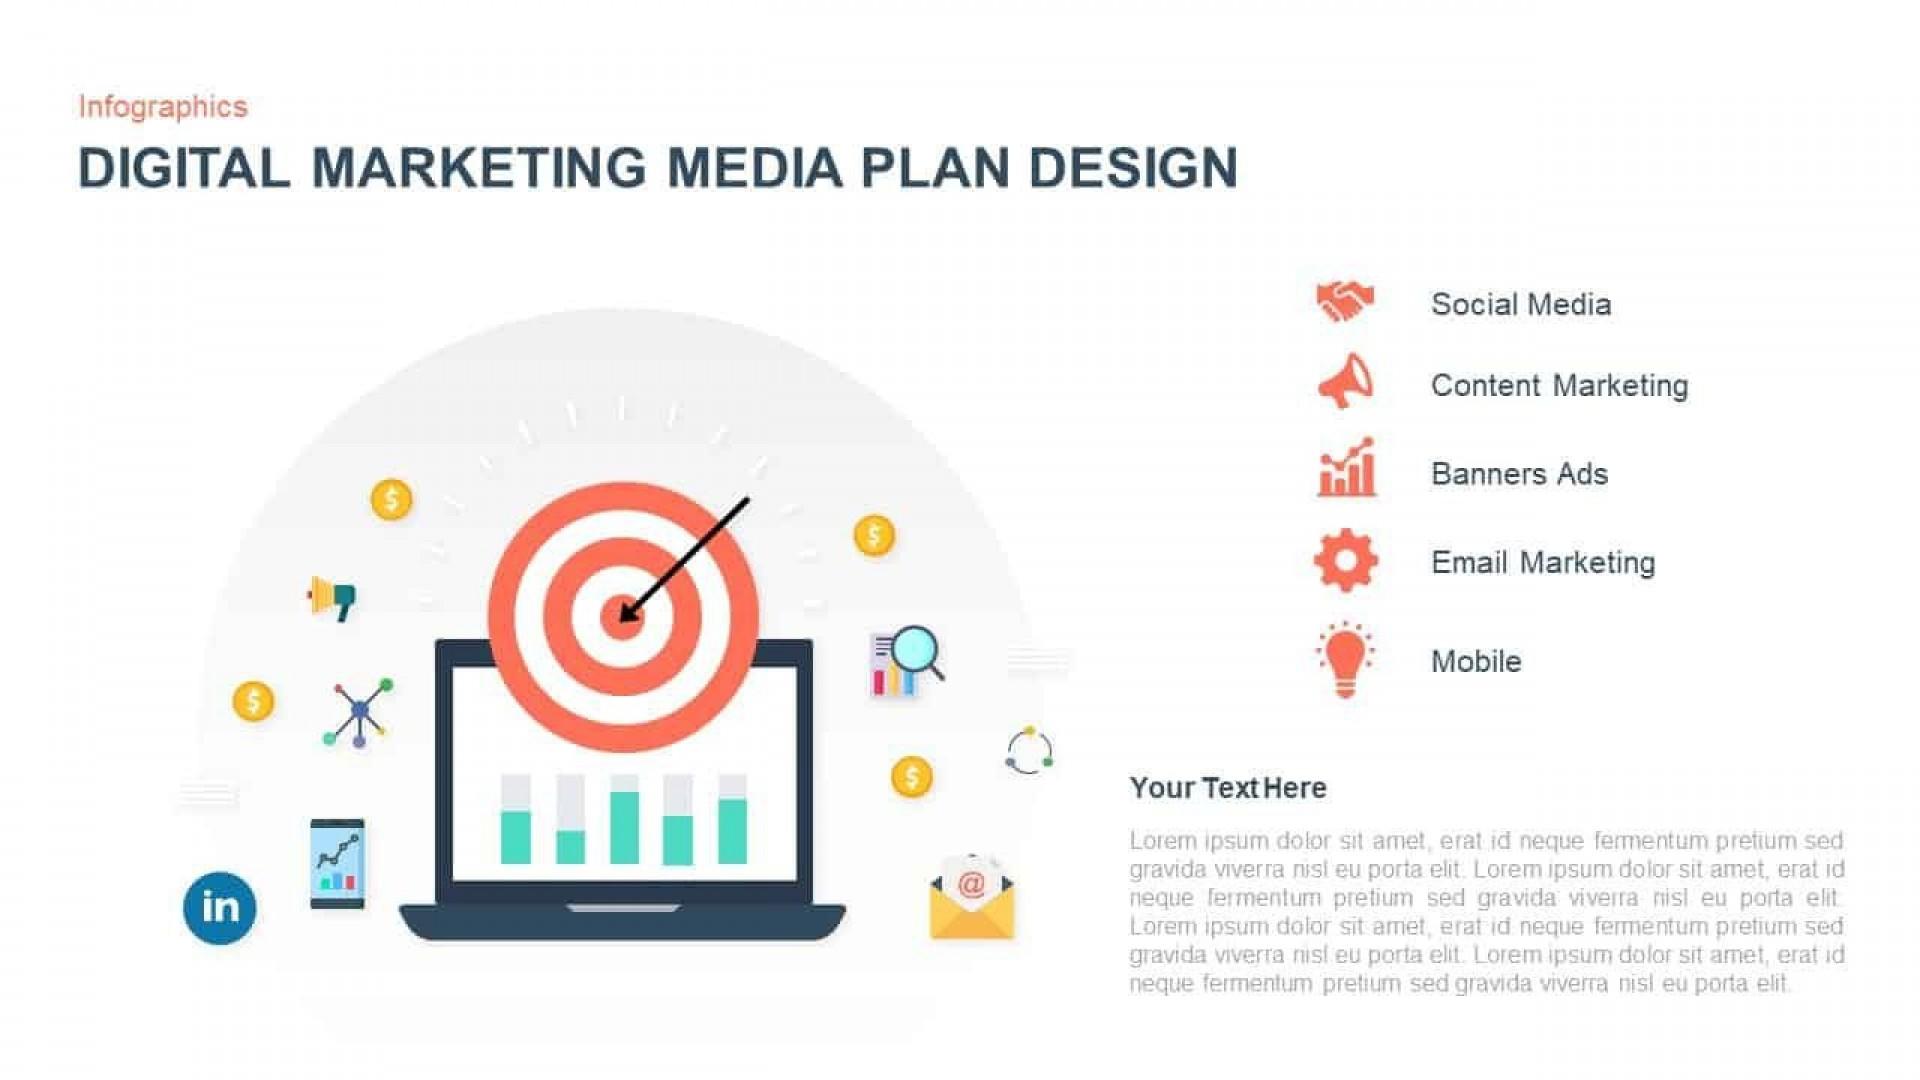 004 Singular Digital Marketing Plan Sample Ppt Inspiration 1920